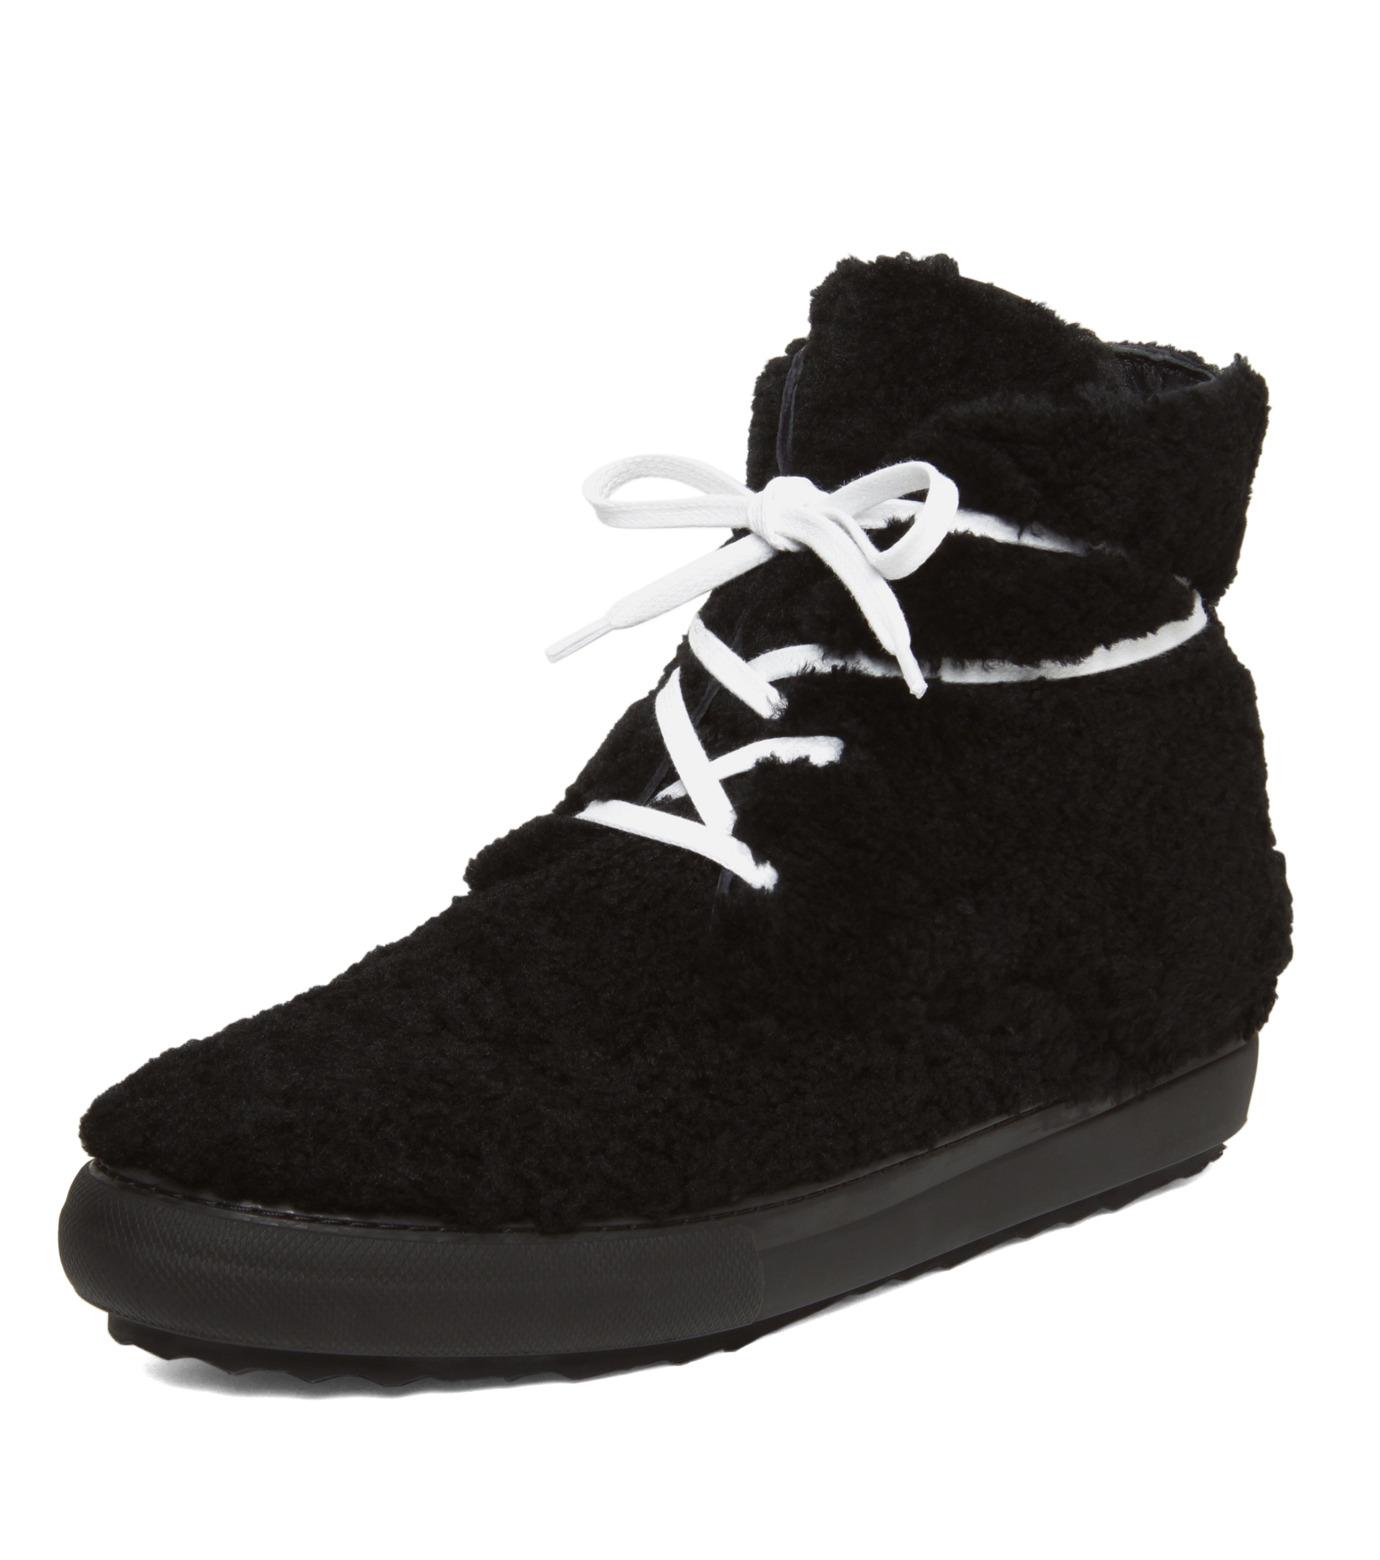 Pierre Hardy(ピエール アルディ)のMoutonChuckerBoots-BLACK(シューズ/shoes)-A4GX02SHEARL-13 拡大詳細画像5